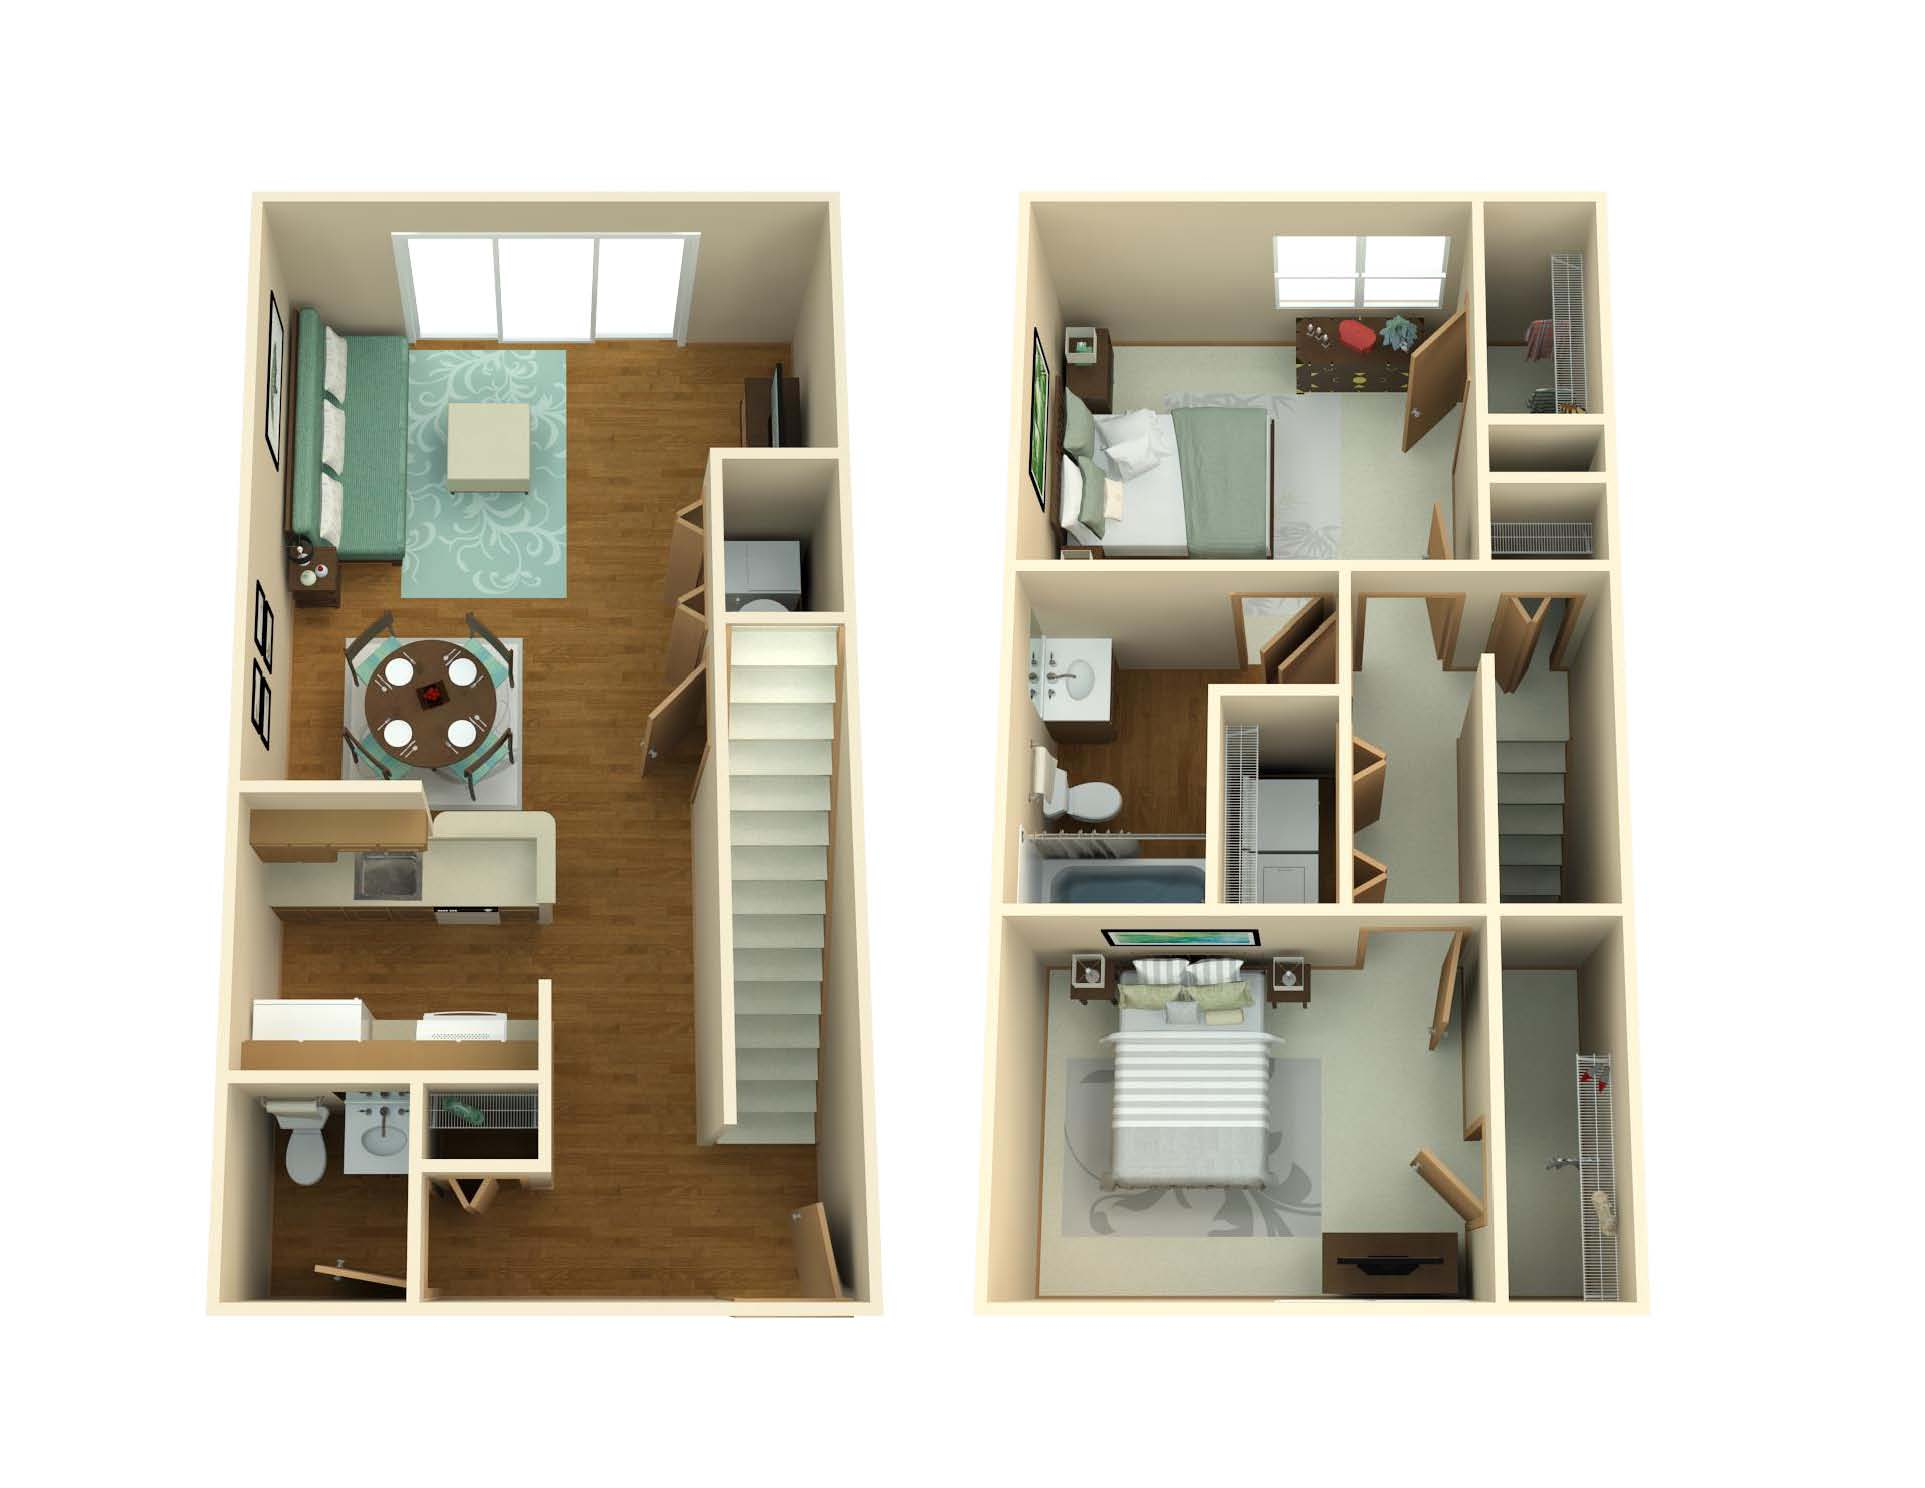 BriceGrove Park Apartments Manor